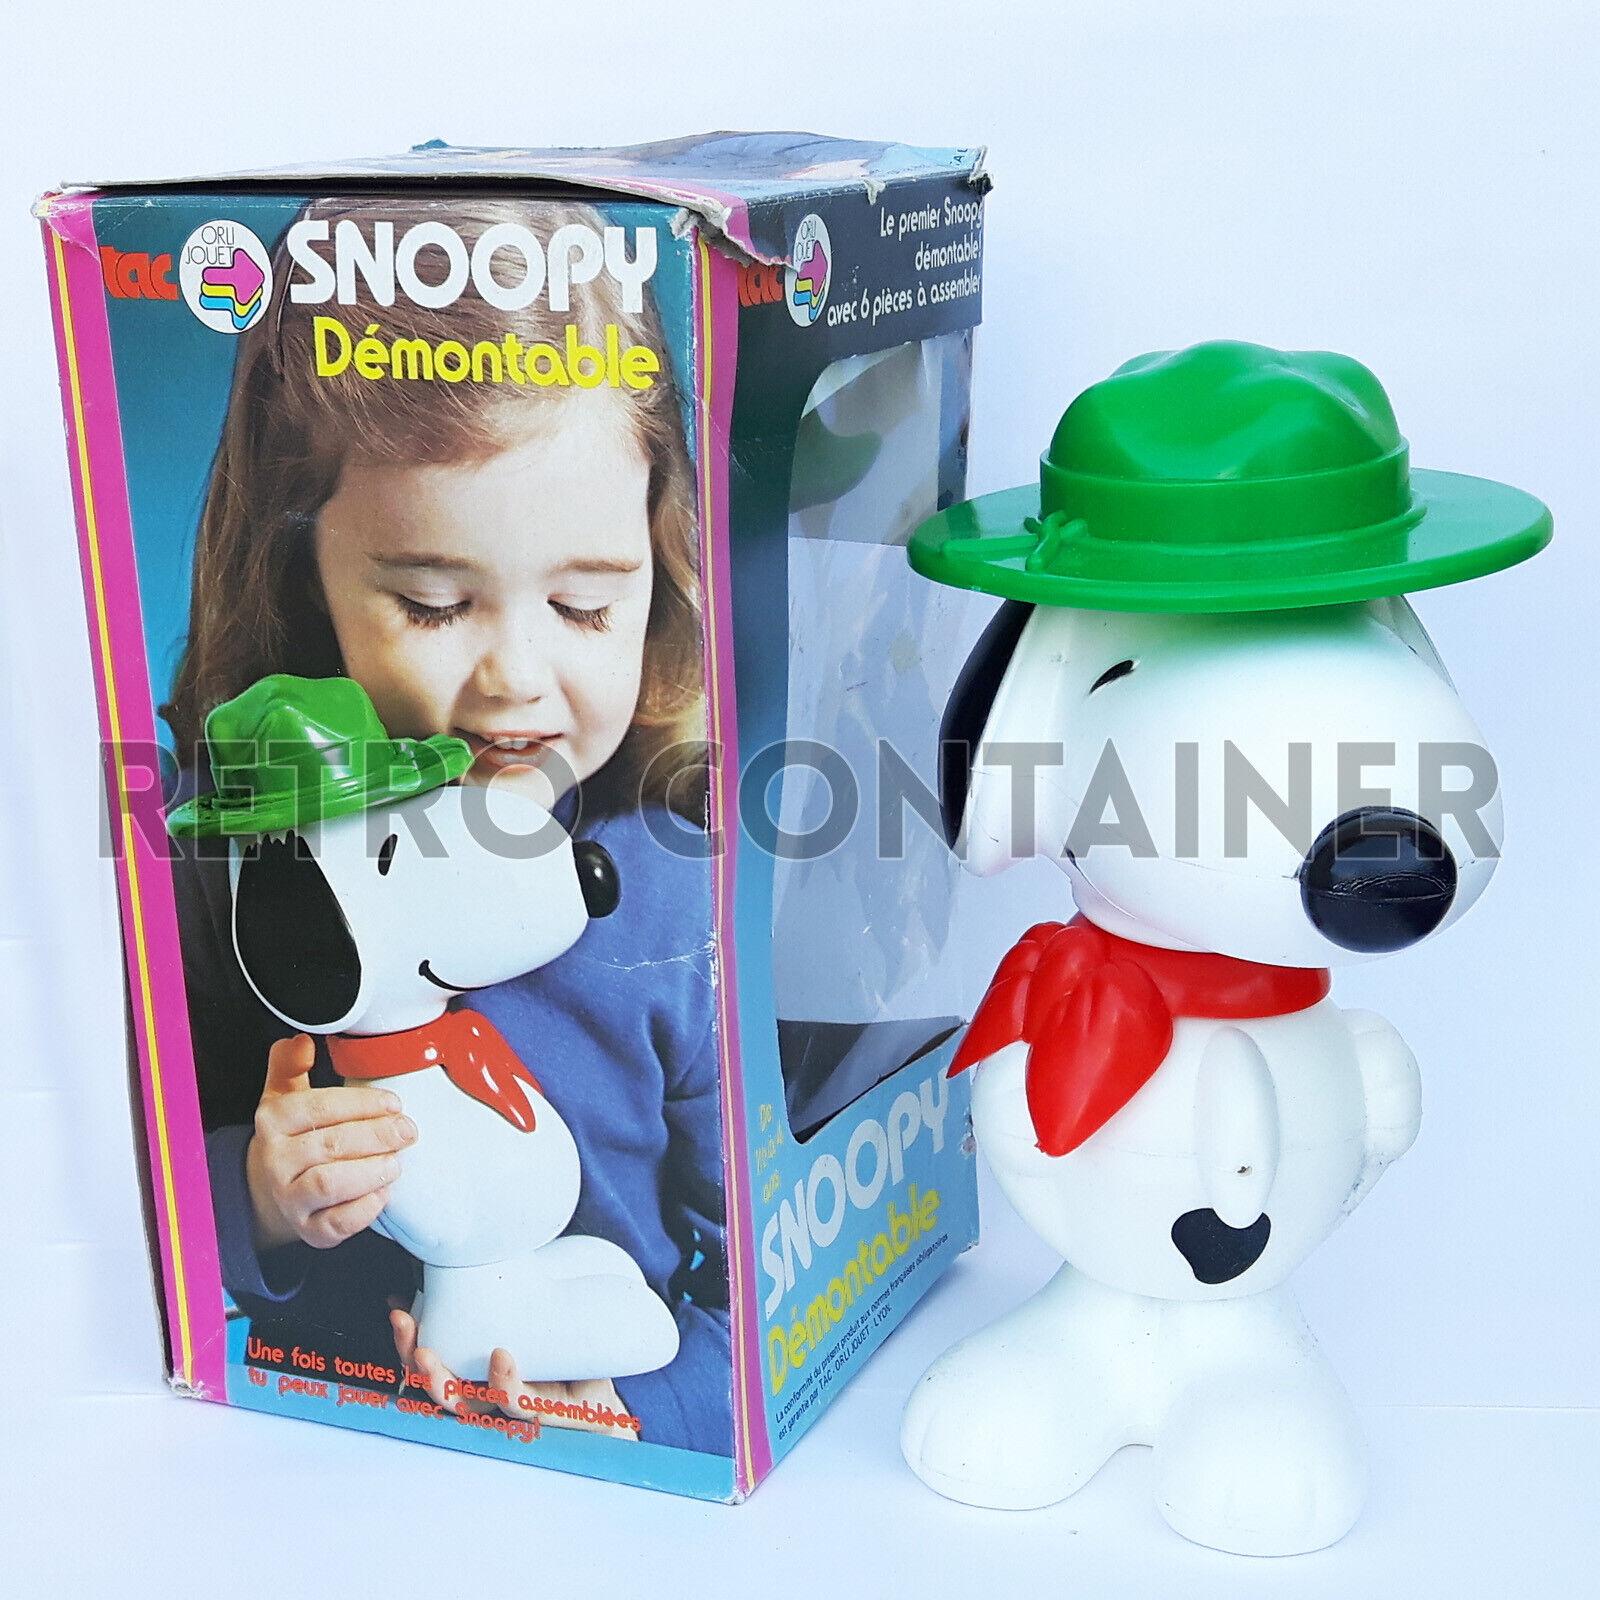 TAC Orli Jouet - SNOOPY Démontable - Faiplast Vintage Toy 1970's Charles Schulz